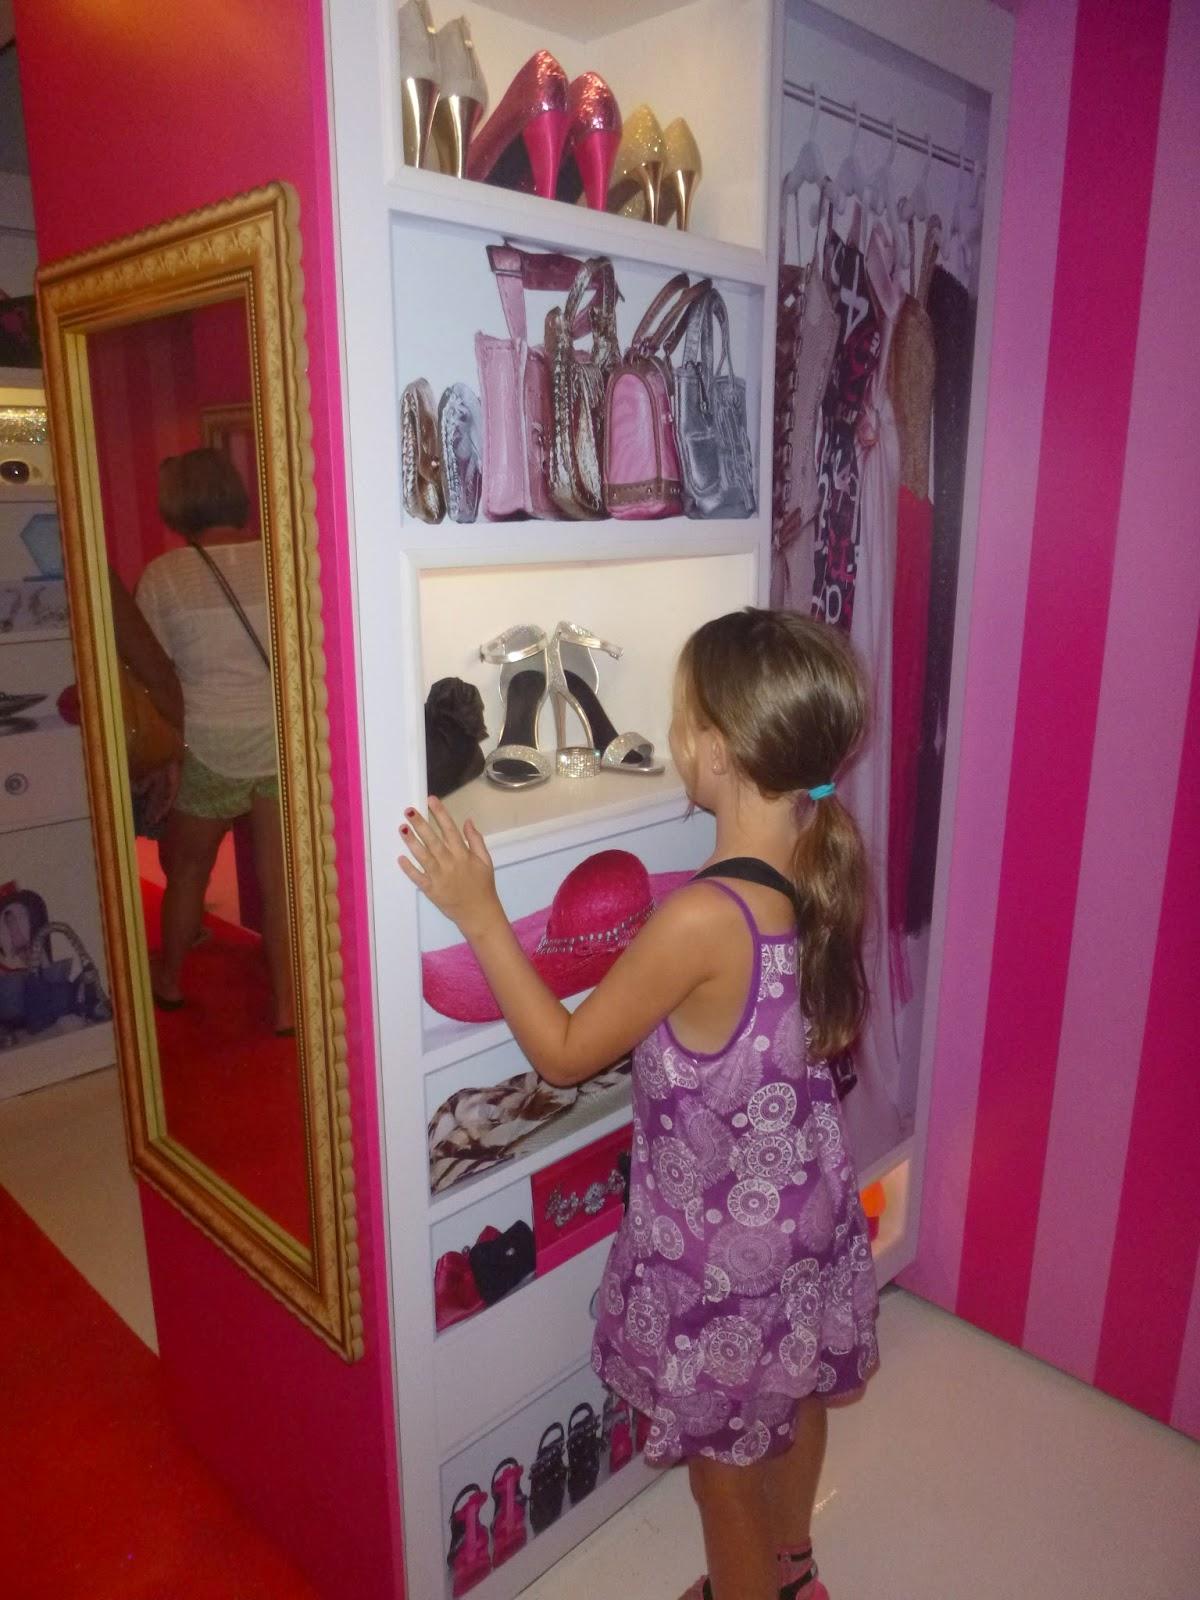 Barbie Dream House Experience Florida: My Journey: Barbie's Dreamhouse Experience, Florida